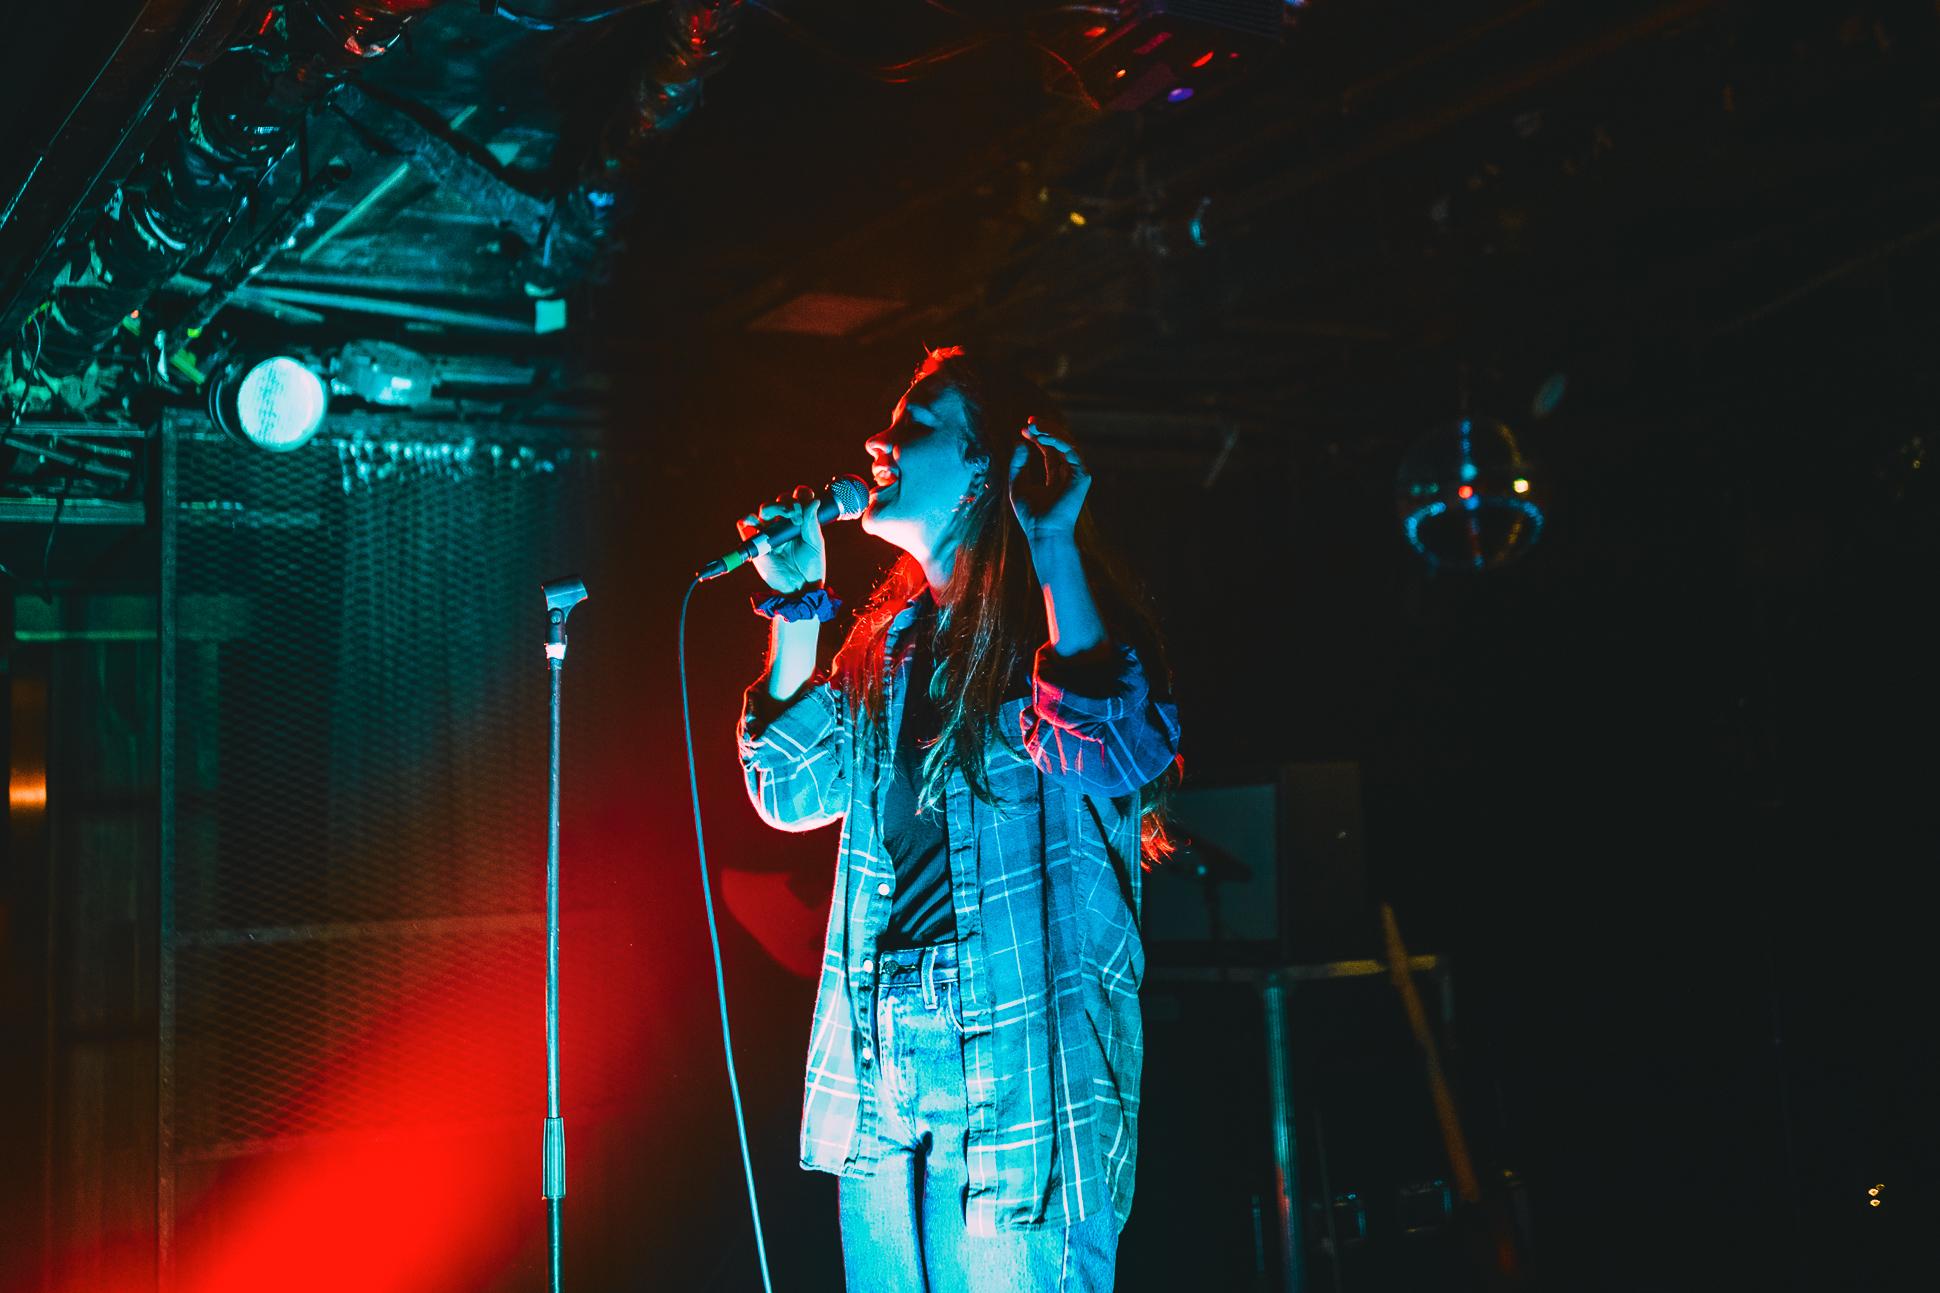 Dizzy-Biltmore-03-05-2019-Vancouver-5862.jpg